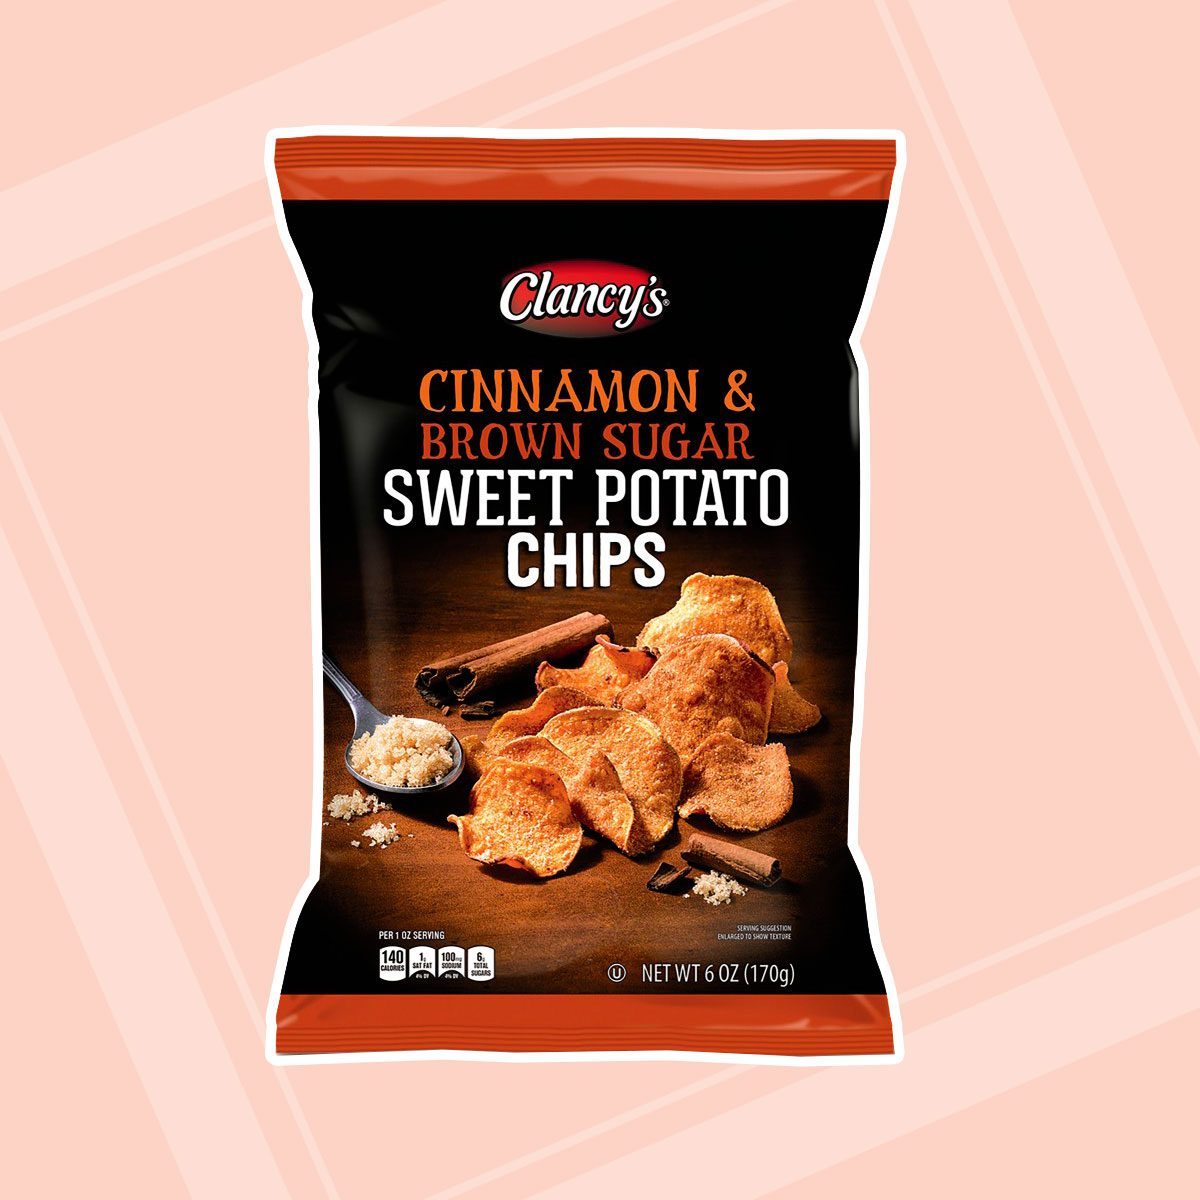 Cinnamon & Brown Sugar Sweet Potato Chips